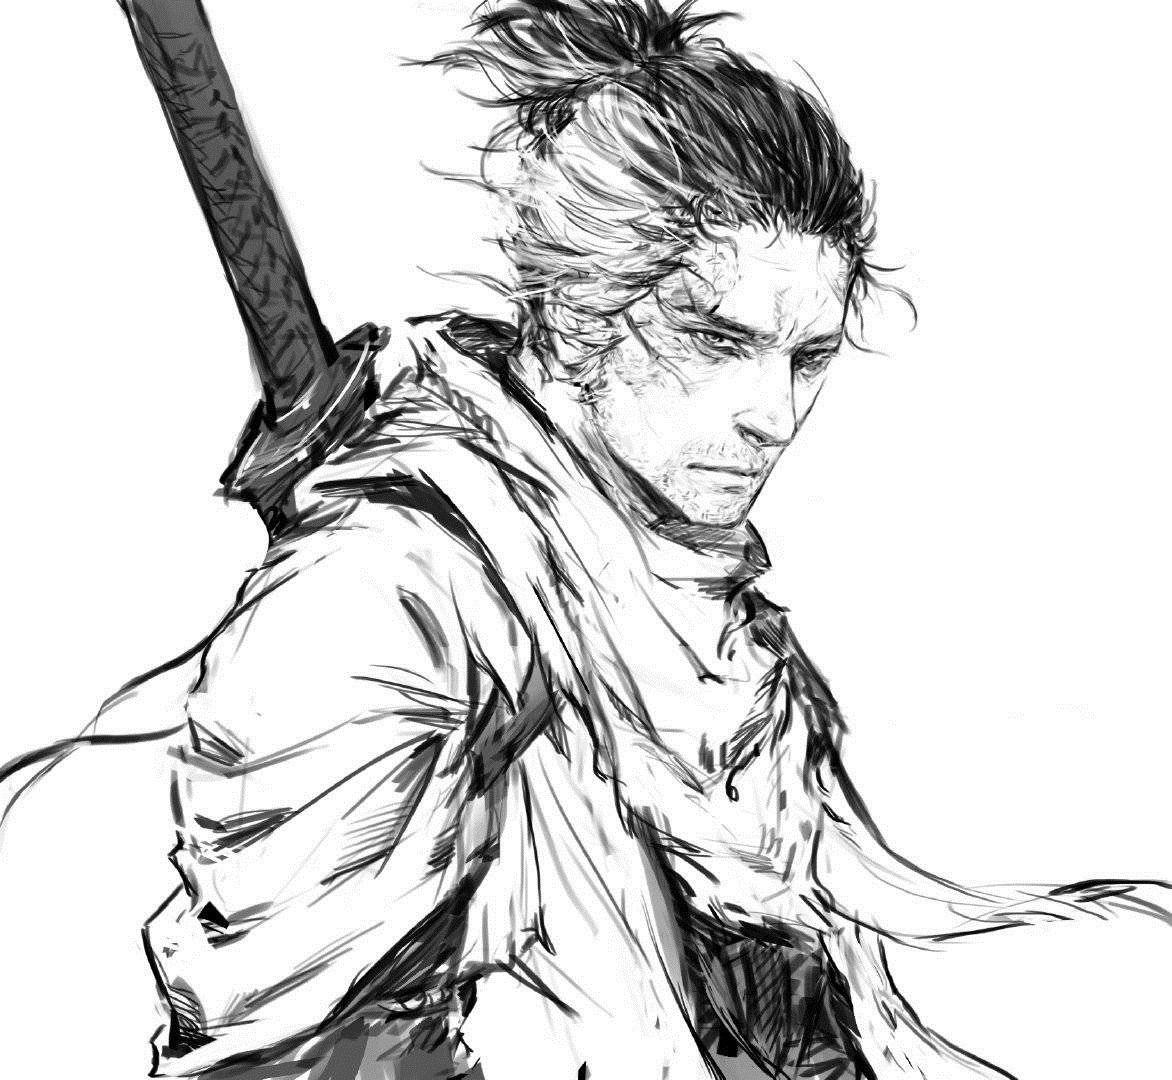 Anime Game Sekiro Shadows Die Twice Character Sekiro Pixiv S Artist 4472508 Samurai Art Samurai Artwork Character Art